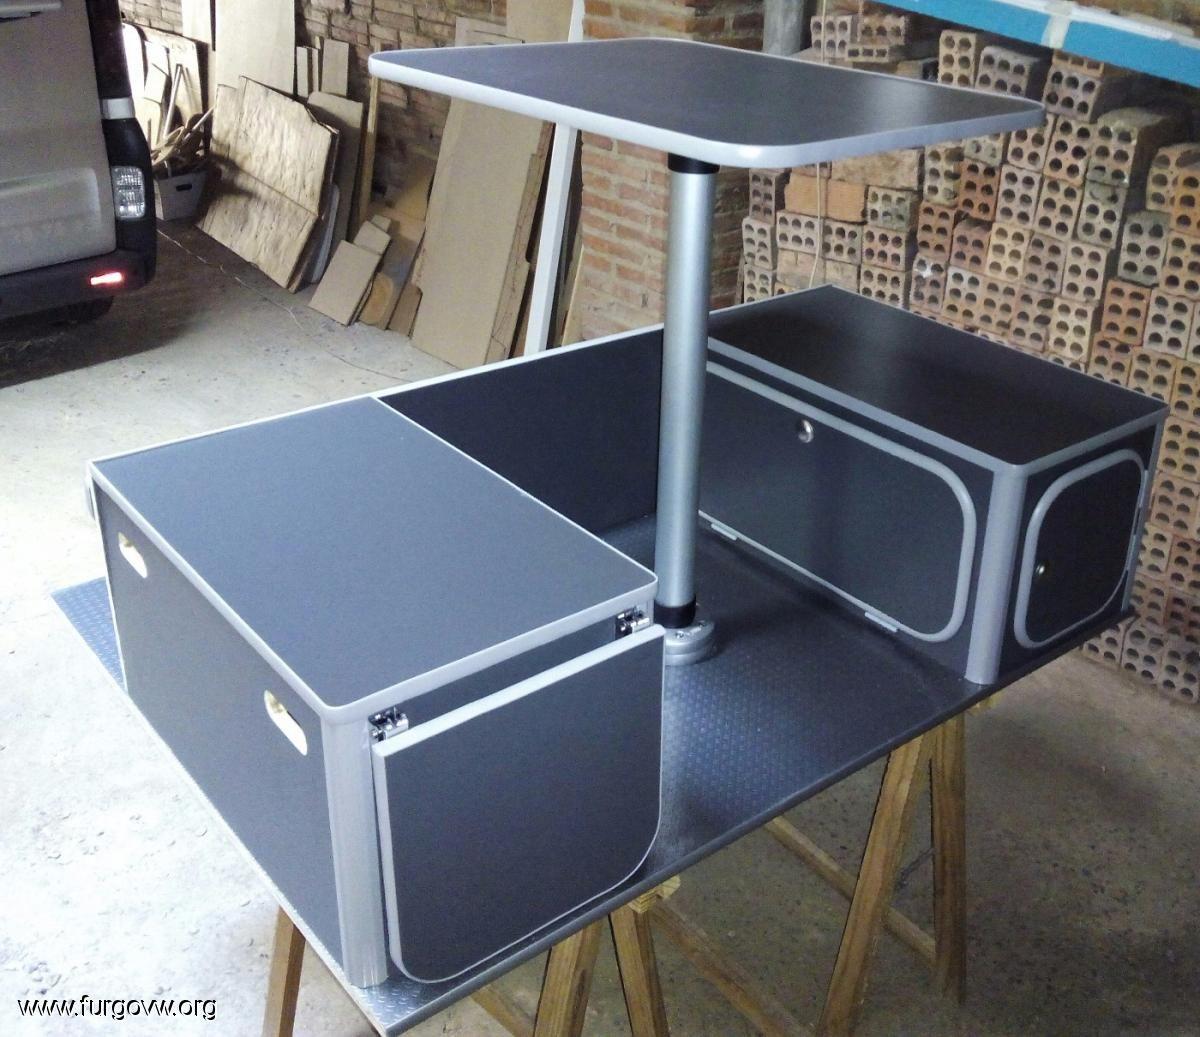 Mueble kit berlingo 2 partner c8 camper monovolumen for Muebles furgoneta camper